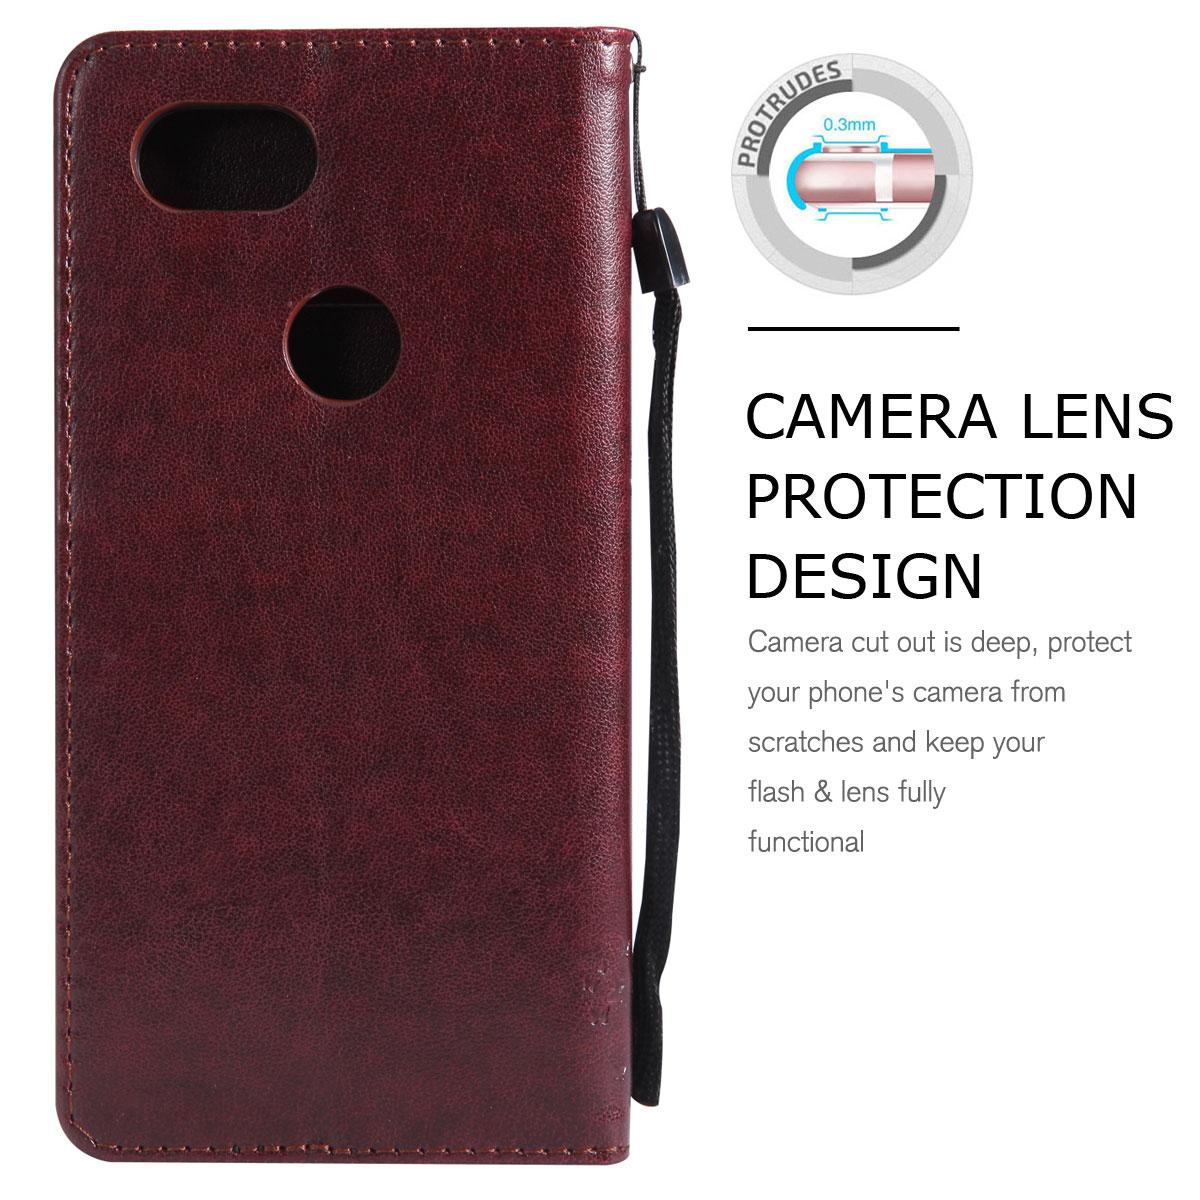 Magnetic-Leather-Credit-Card-Holder-Flip-Case-Cover-For-Google-Pixel-2-2-XL thumbnail 77